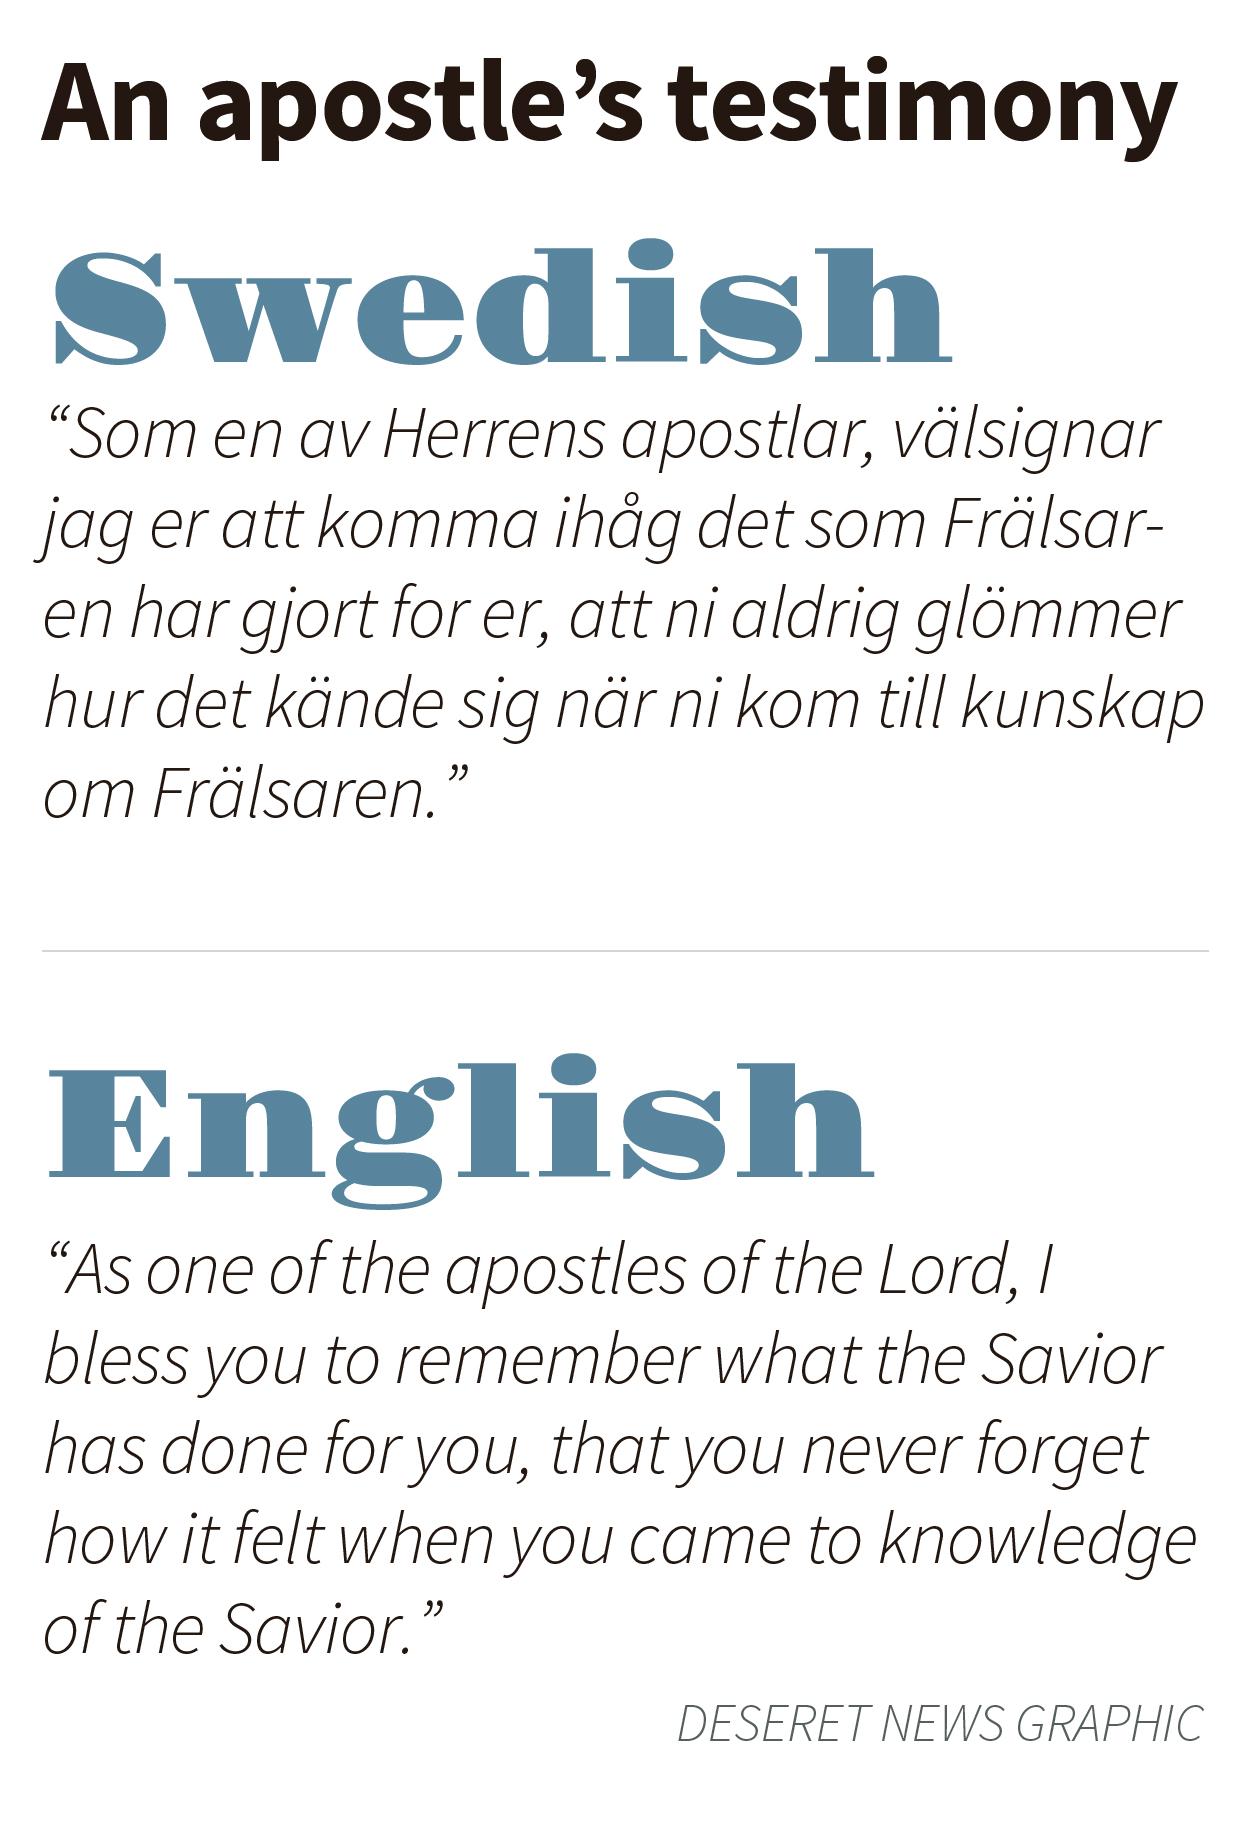 Elder Renlund's testimony in Swedish, with an English translation